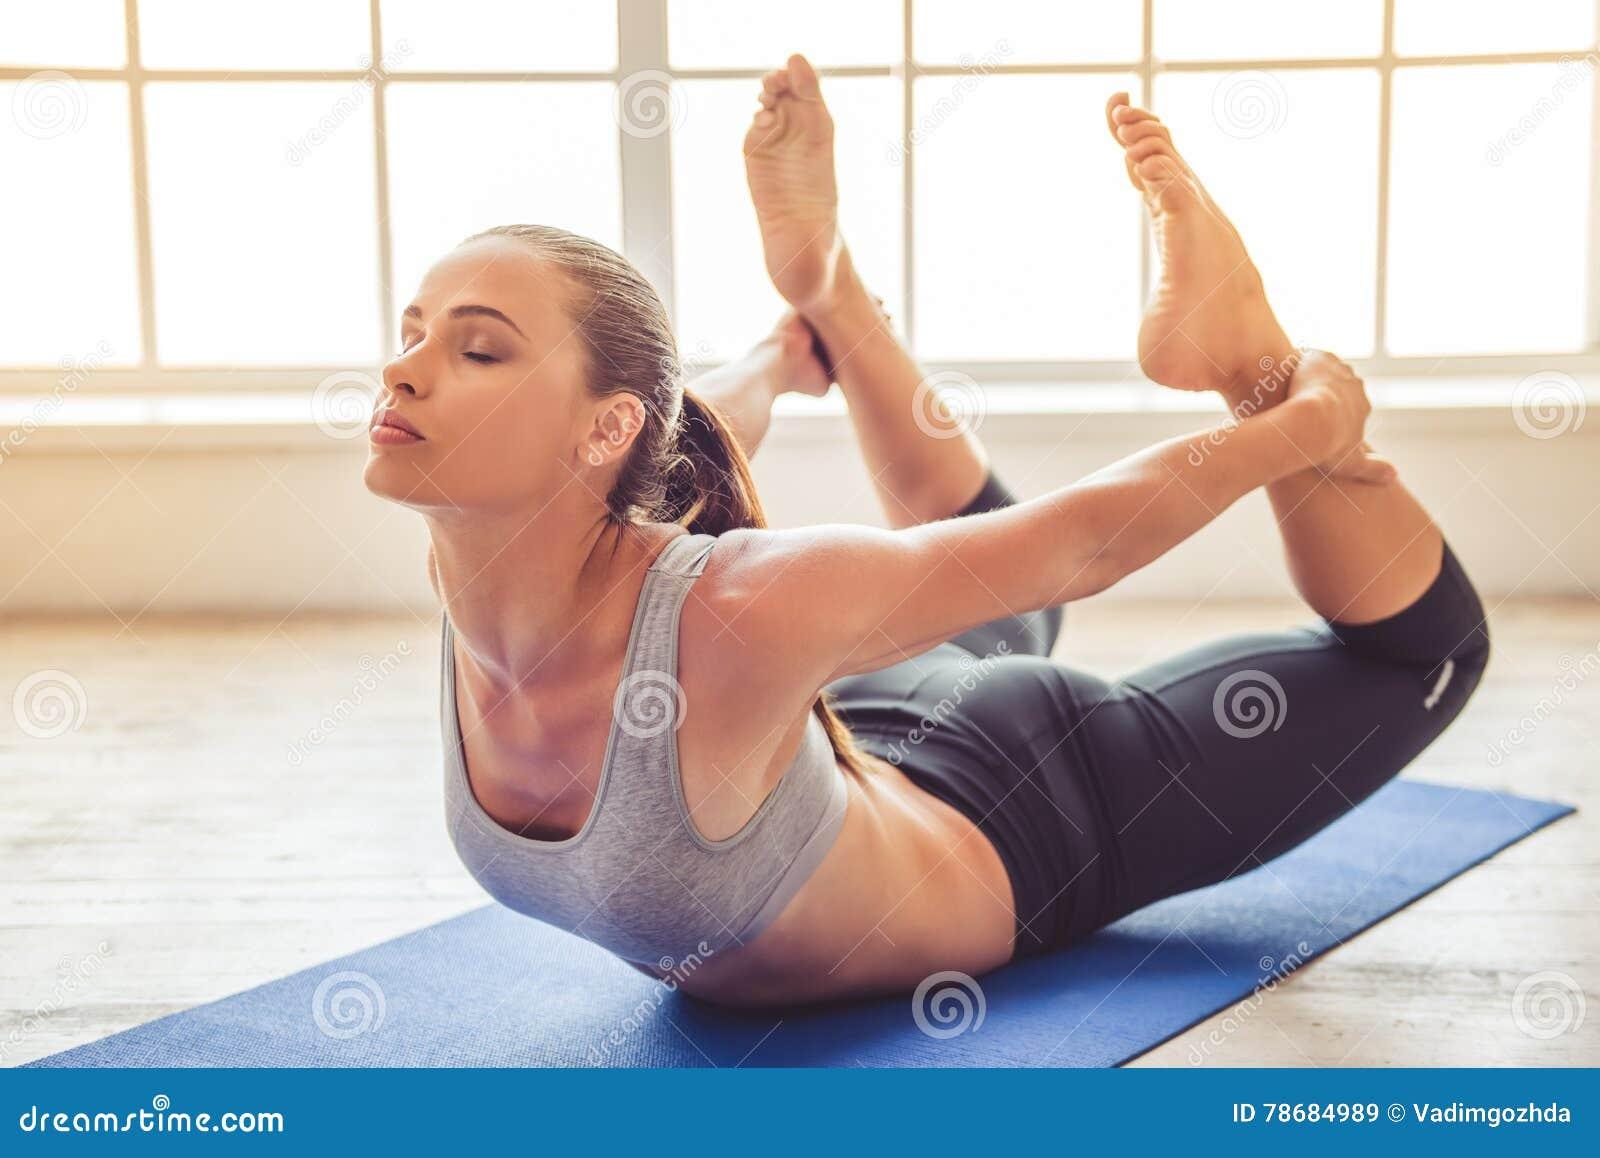 young beautiful pregnant woman doing yoga stock photo